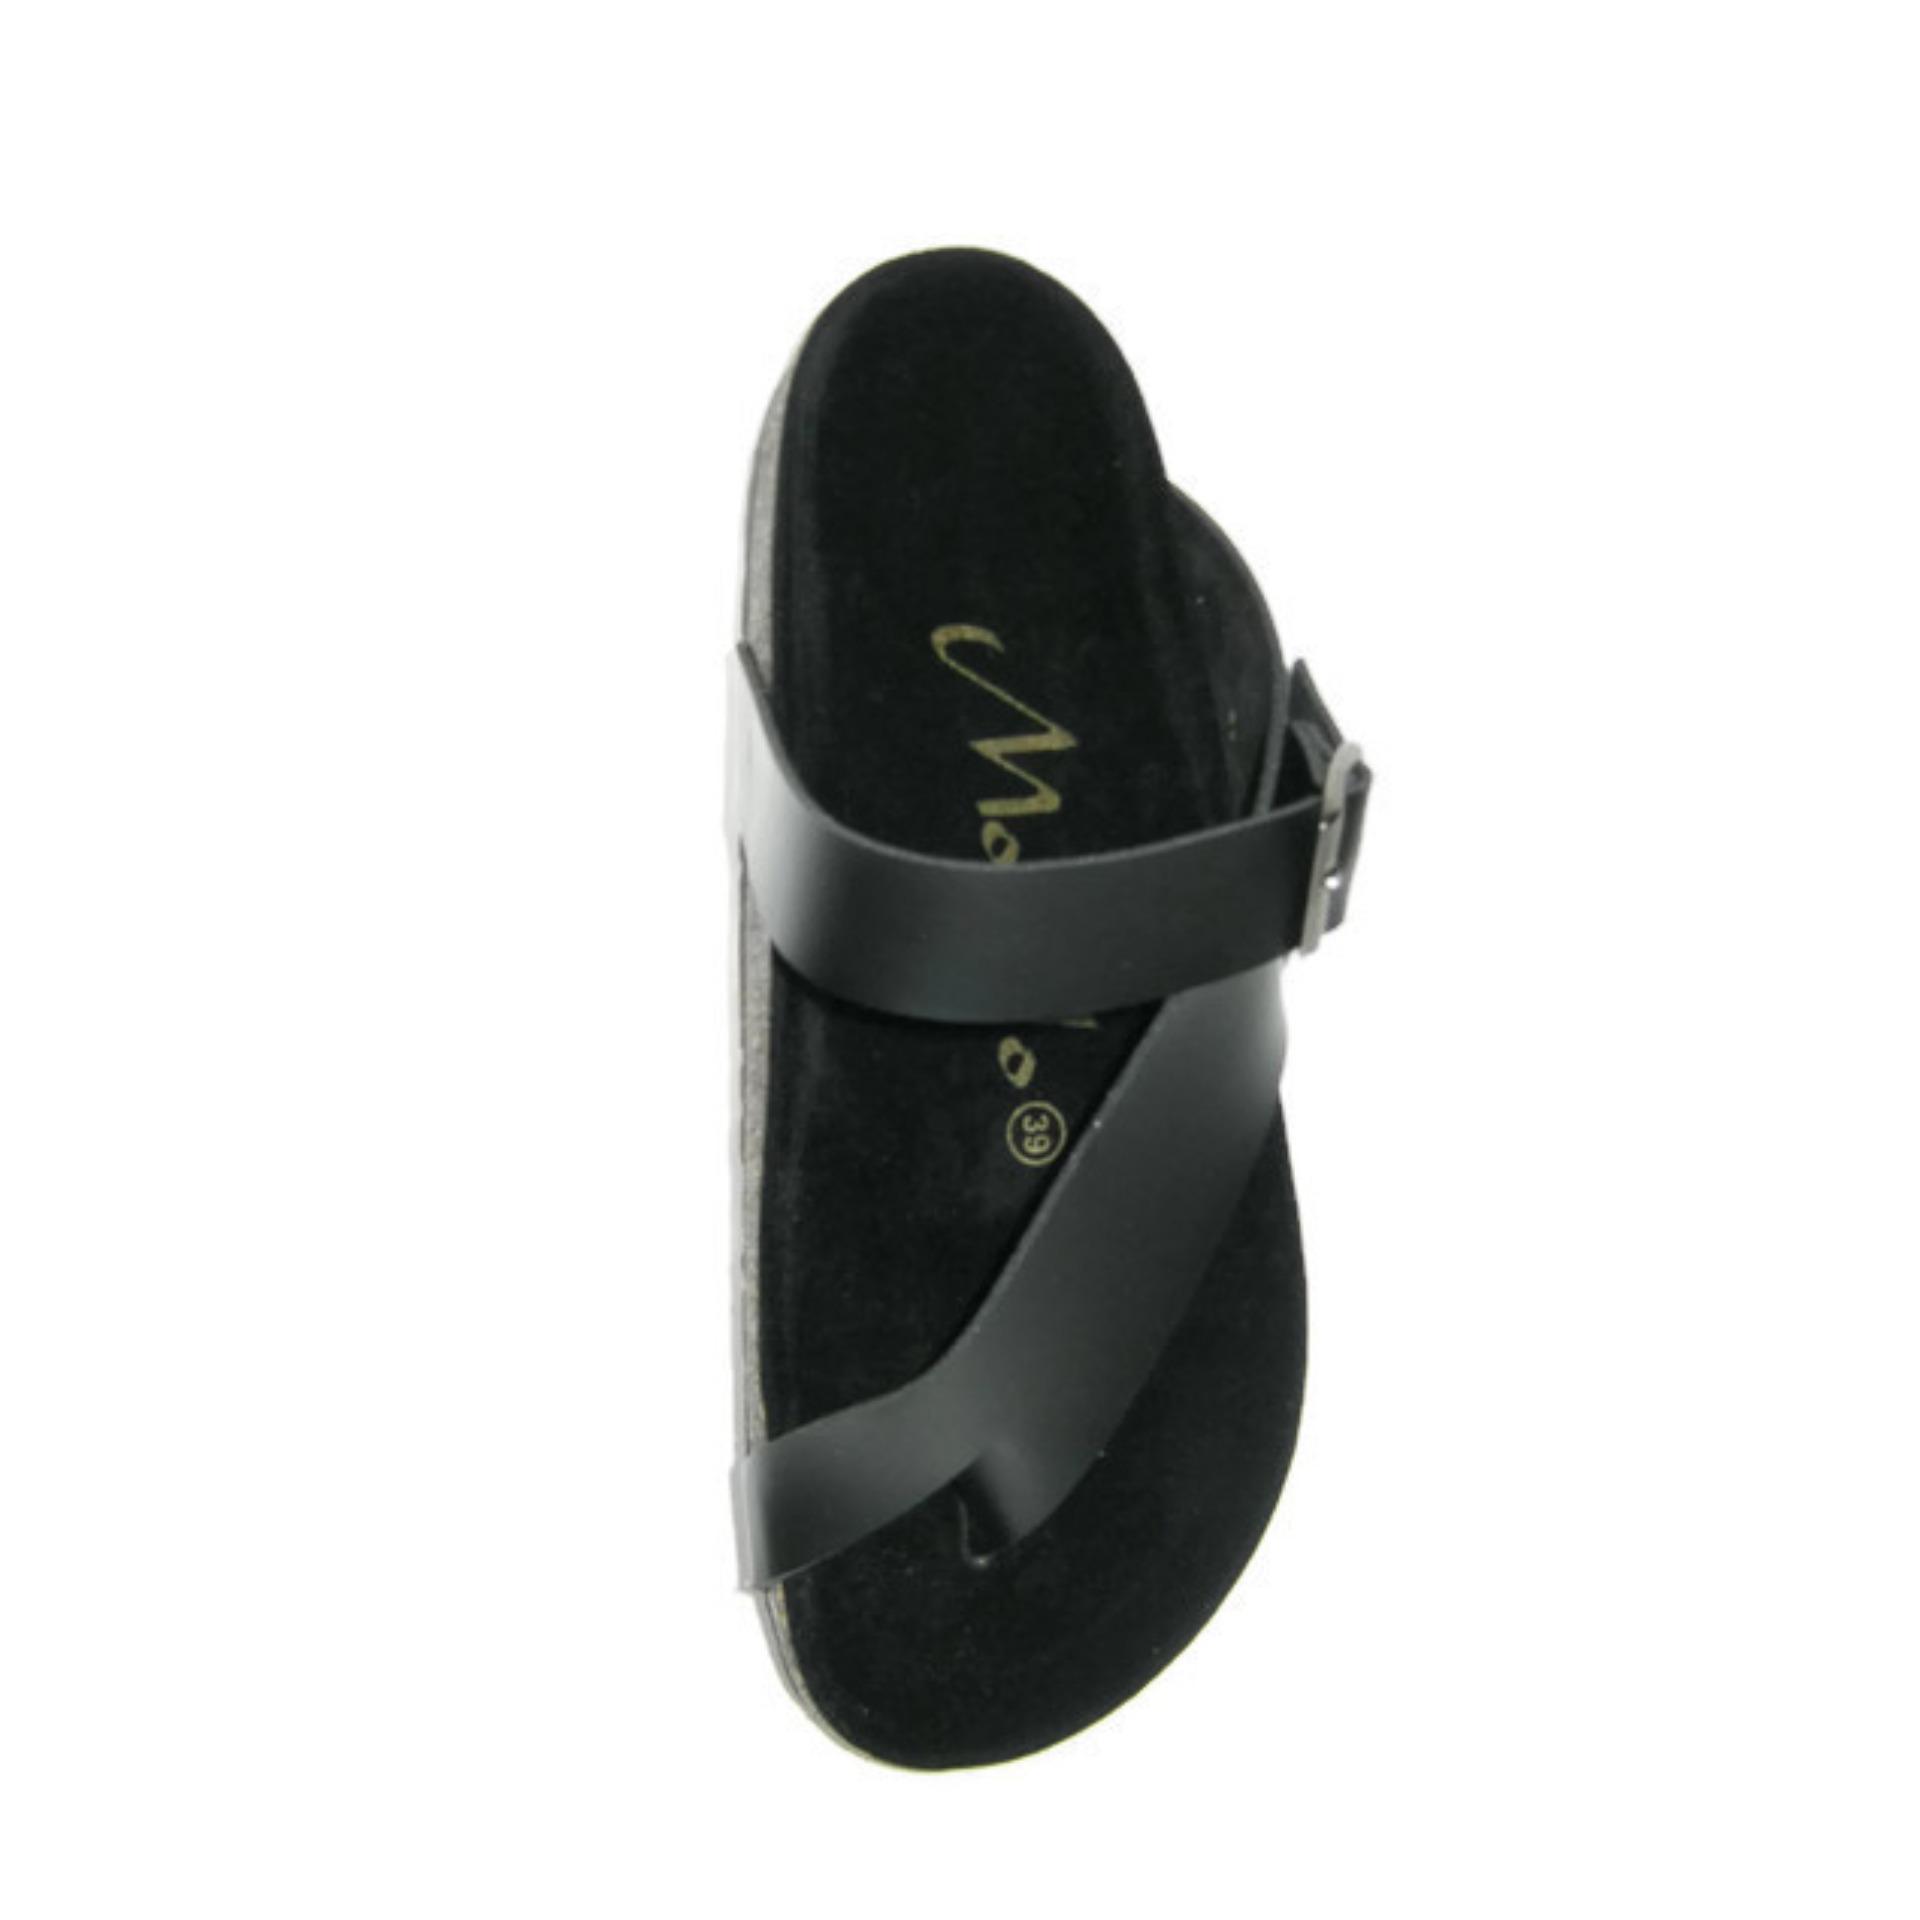 Morello Sandal Mens Japit Hitam Daftar Harga Terlengkap Indonesia Asus Zenfone Go Zb450kl Smartphone Red 1